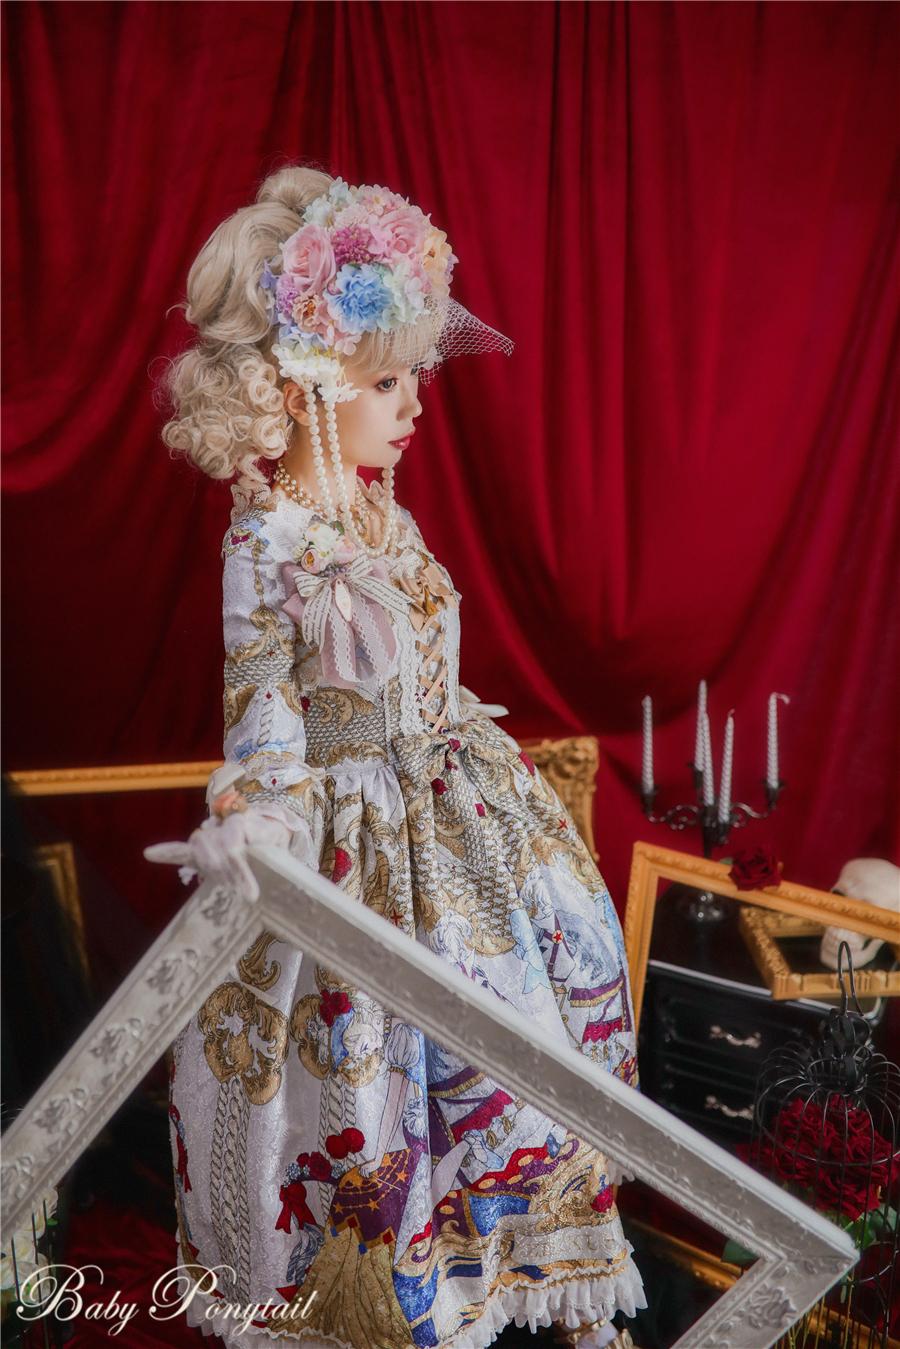 Baby Ponytail_Circus Princess_Silver OP_Kaka_19.jpg